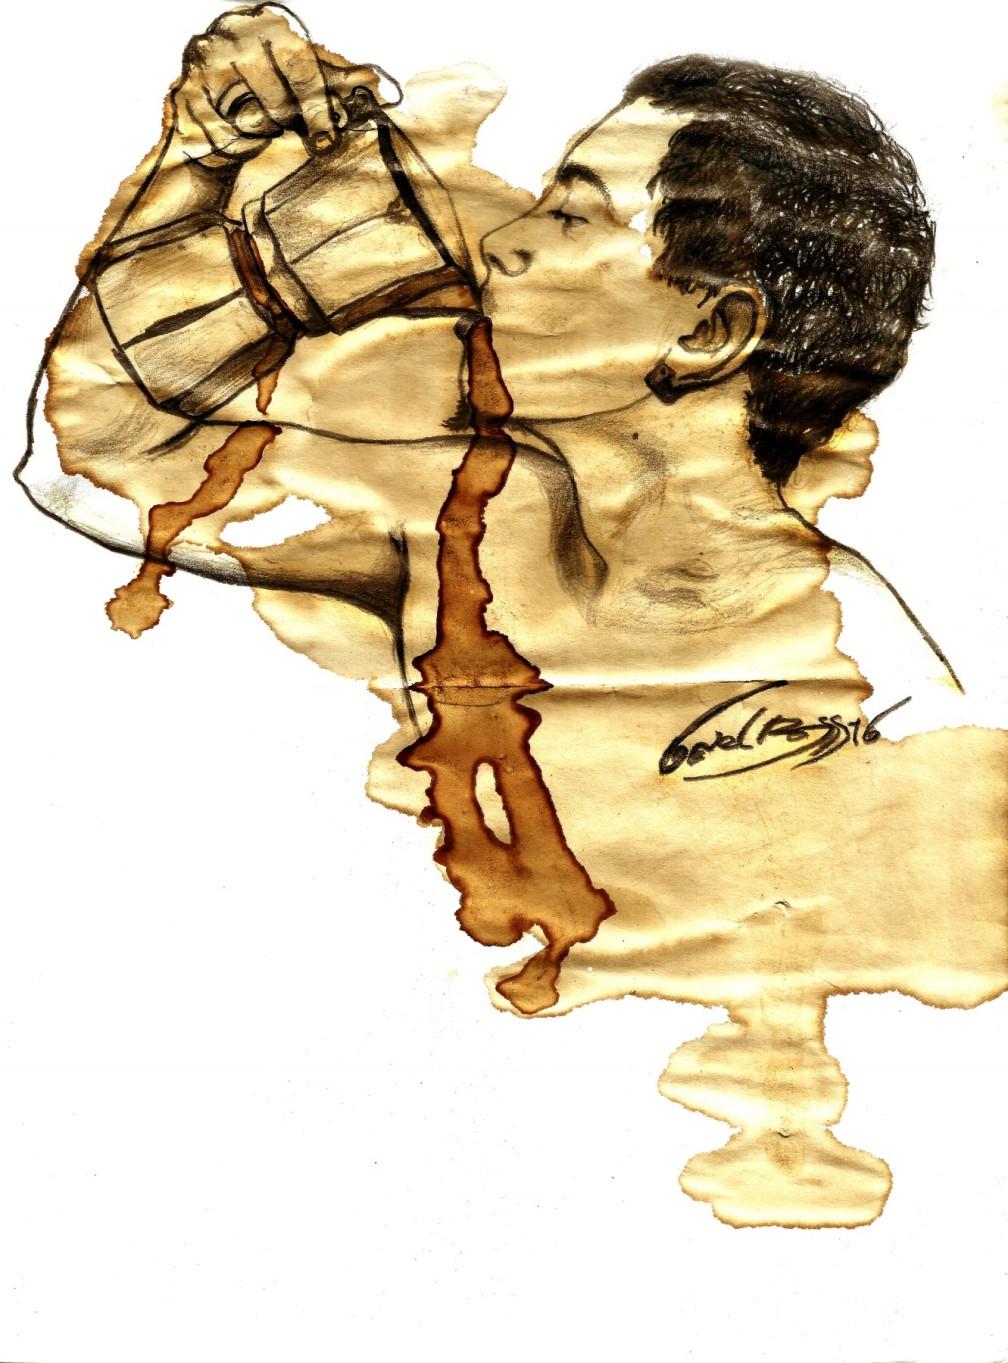 Las huellas que deja el café al levantarme - Daniel Ross Dieguez Guantánamo - Cuba (3)